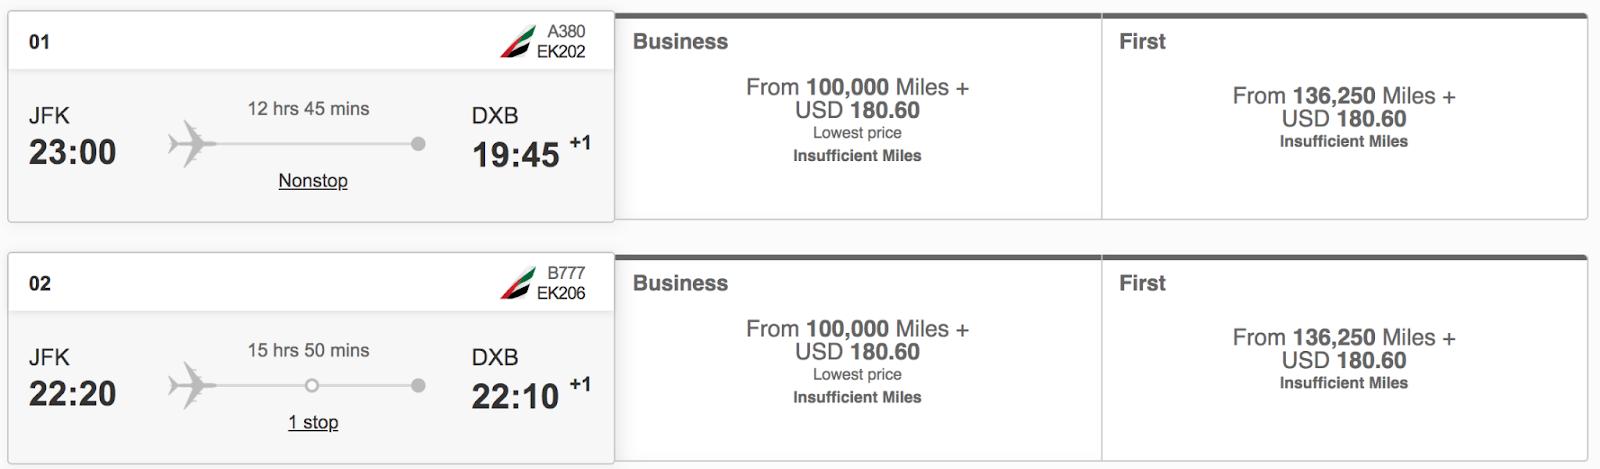 One way business class Emirates flight